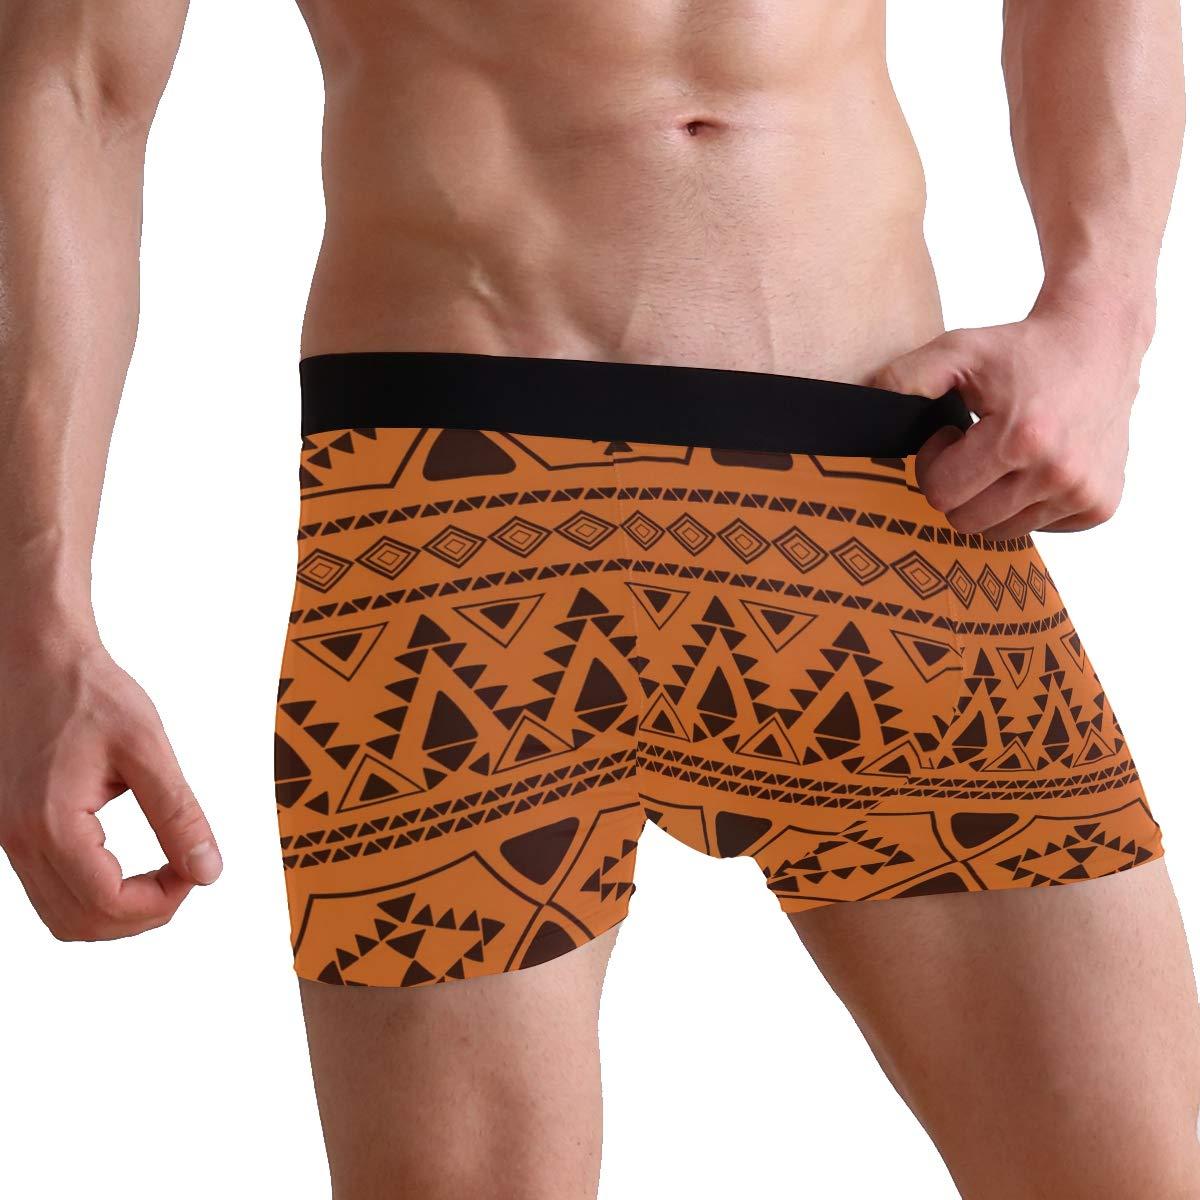 SUABO Mens 2-Pack Boxer Briefs Polyester Underwear Trunk Underwear with Ethnic Pattern Design